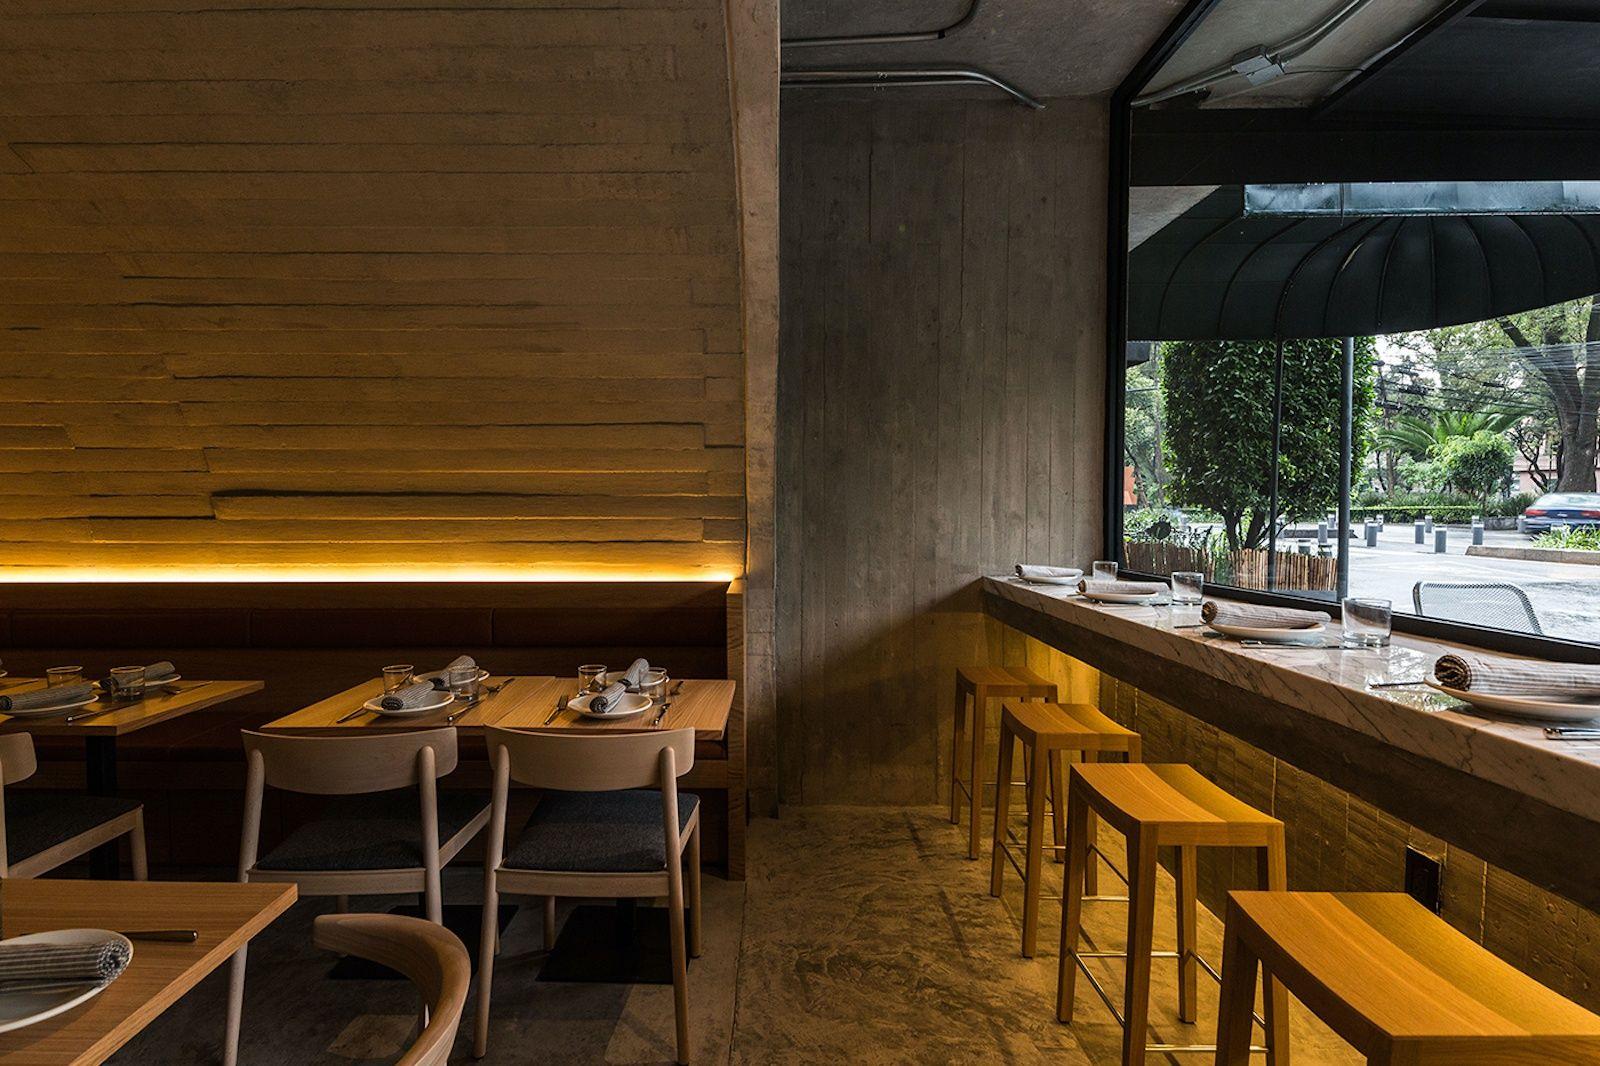 Sartoria Mexico City Mexico Ignant In 2020 Restaurant Interior Design Mexico City Restaurants White Marble Bar